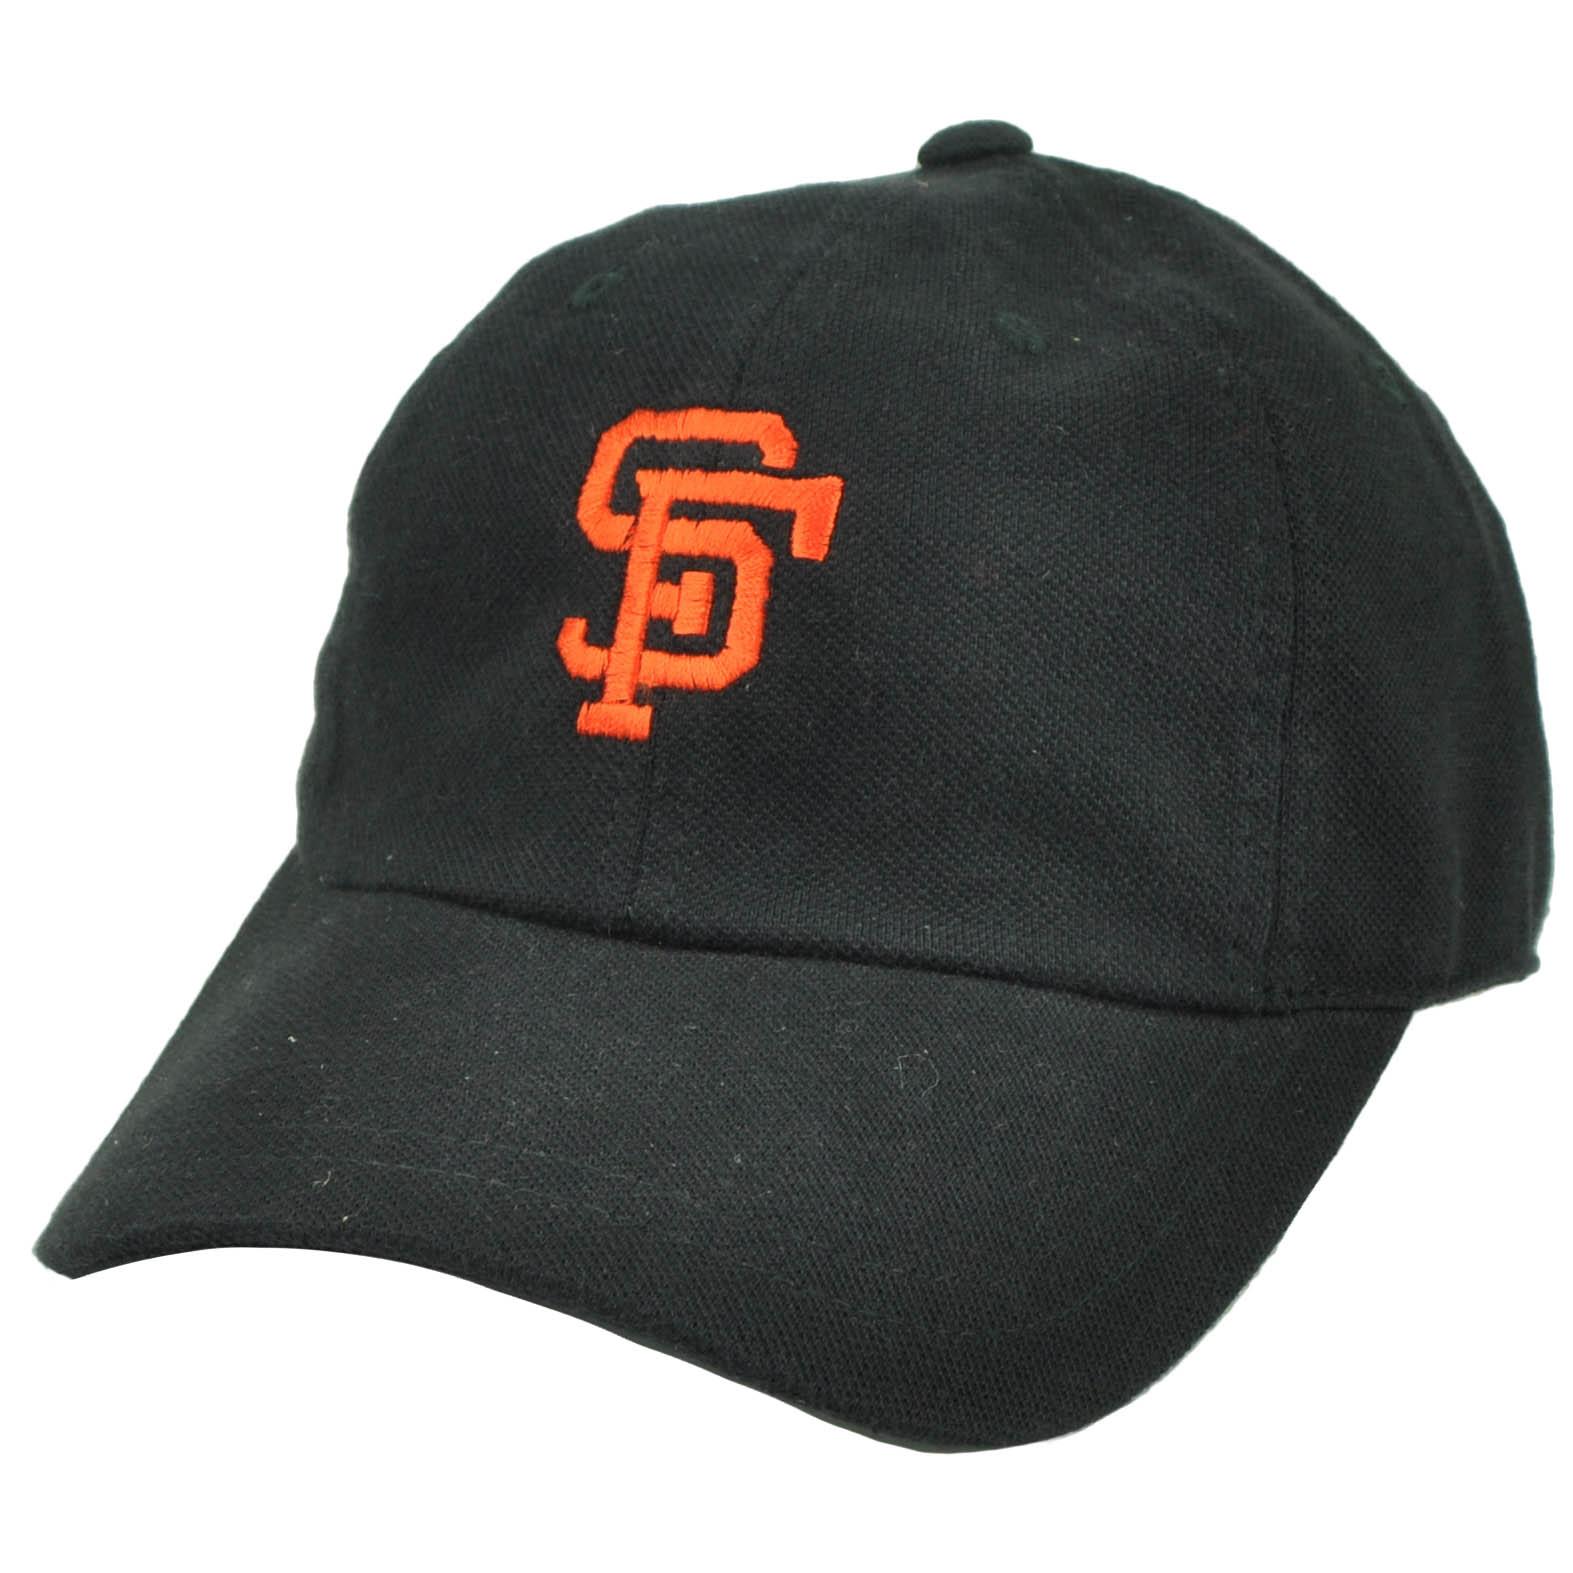 dfe7bfca2b2 San Francisco Giants American Needle Black Relaxed Hat Cap Adjustable  Baseball